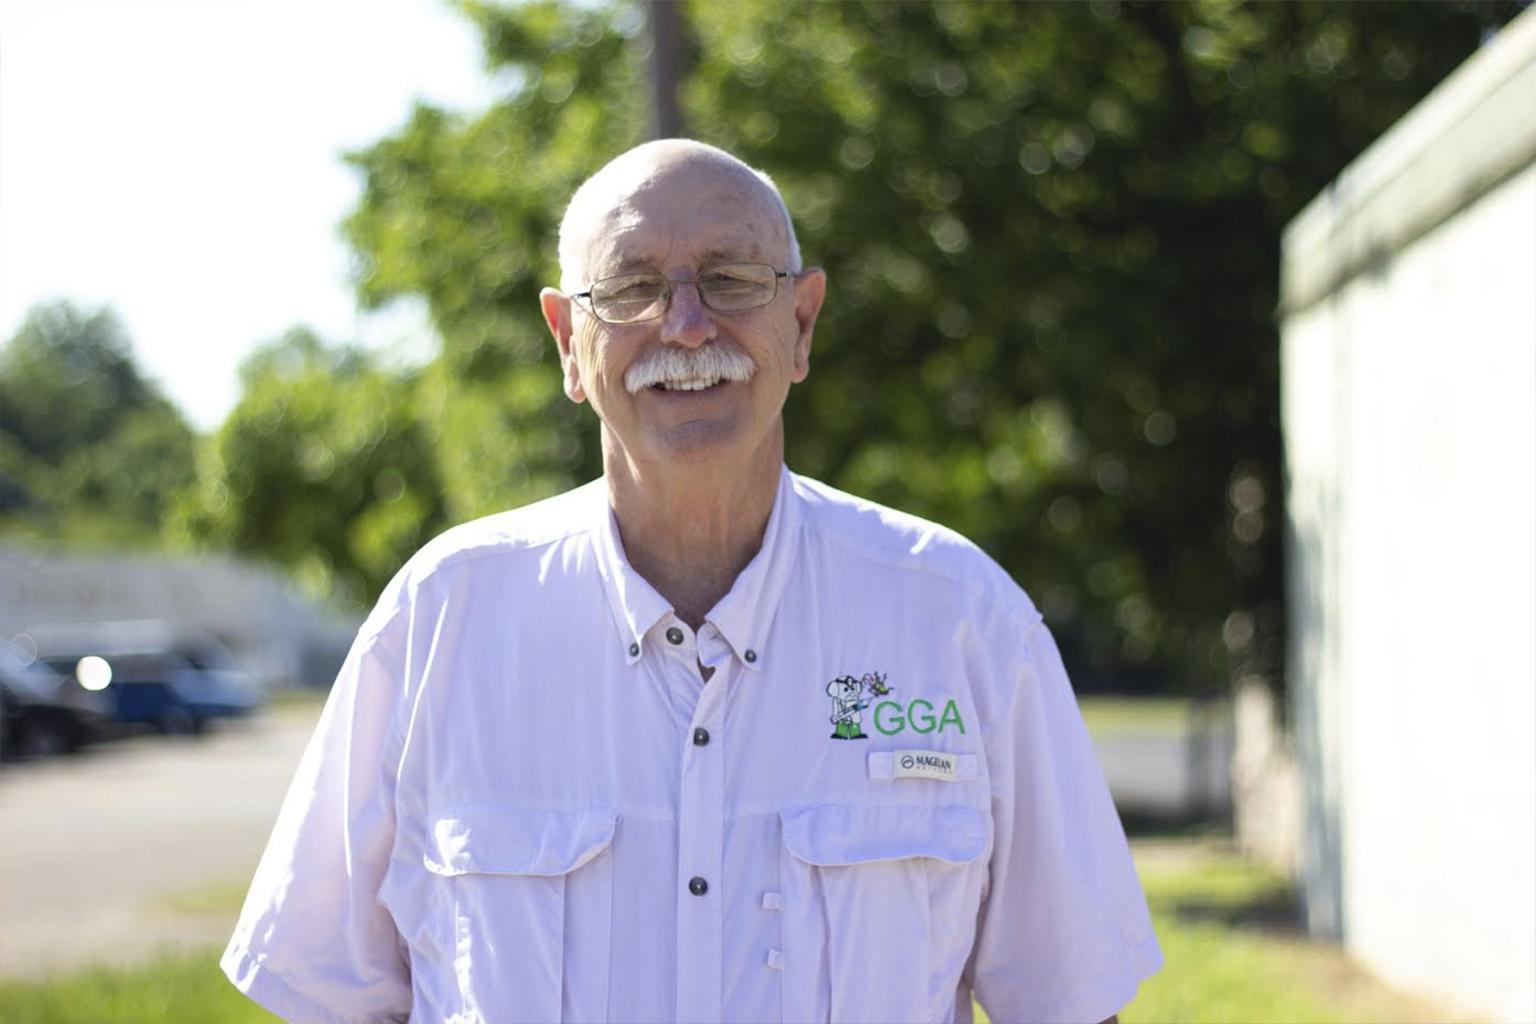 Fred owner staff gga pest management